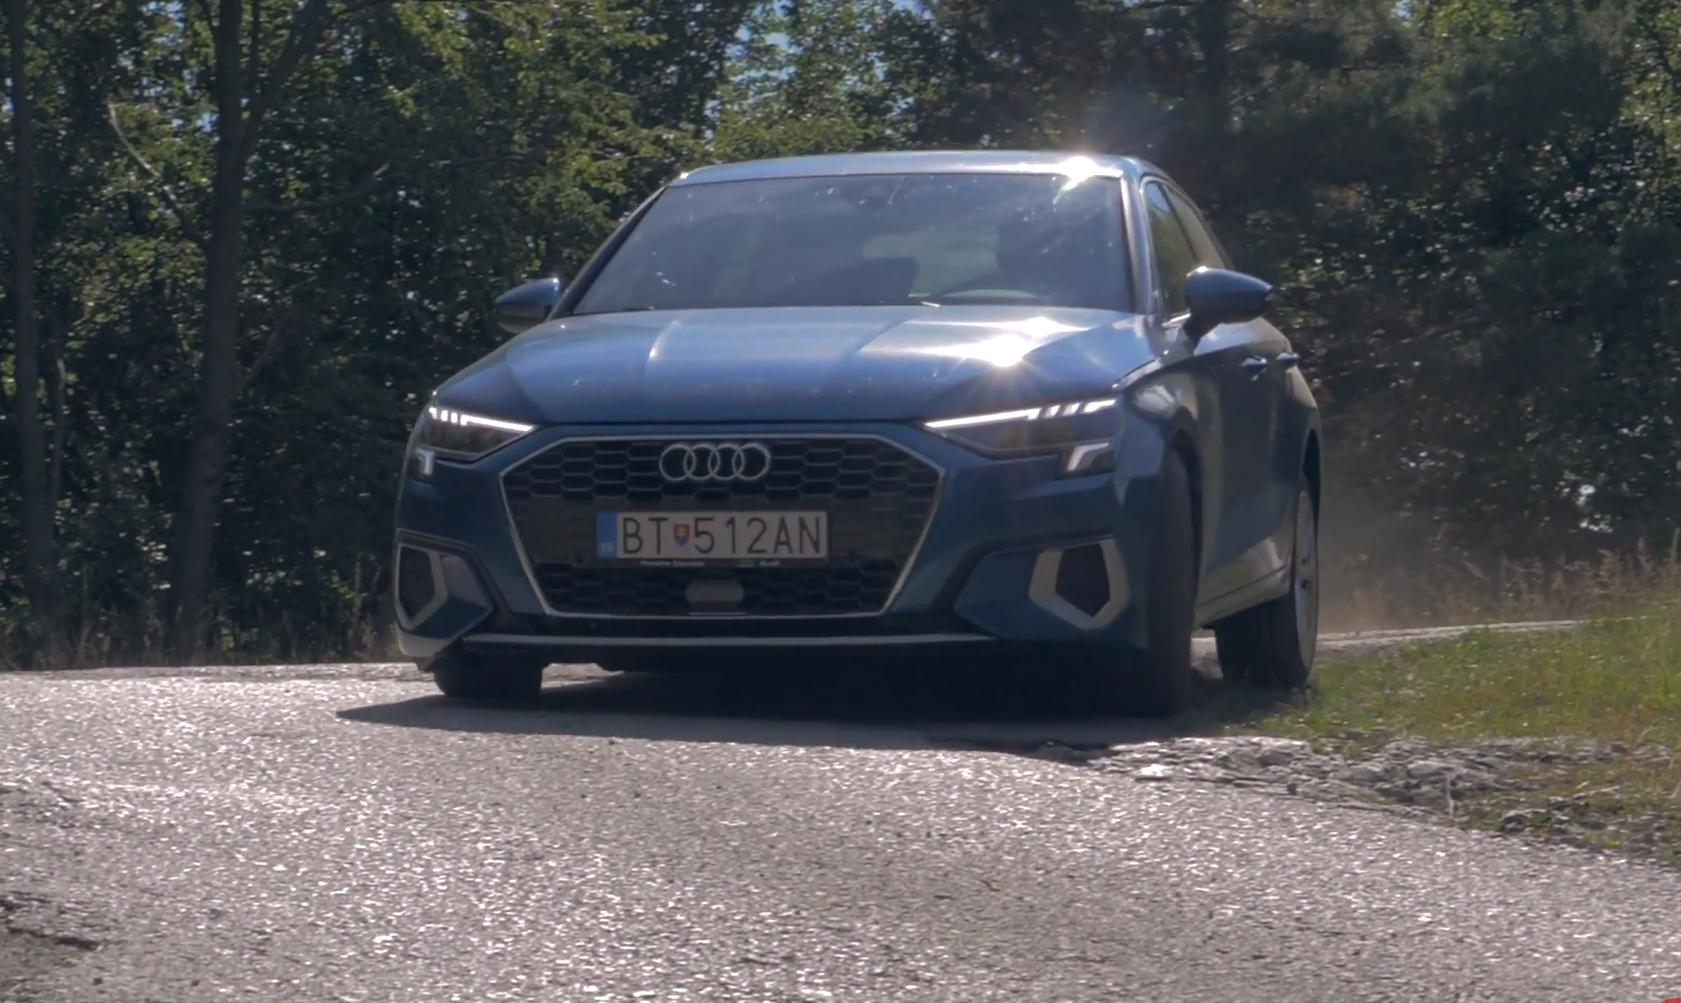 Audi A3 Sportback zaujalo podvozkom, priestorom nesklamalo